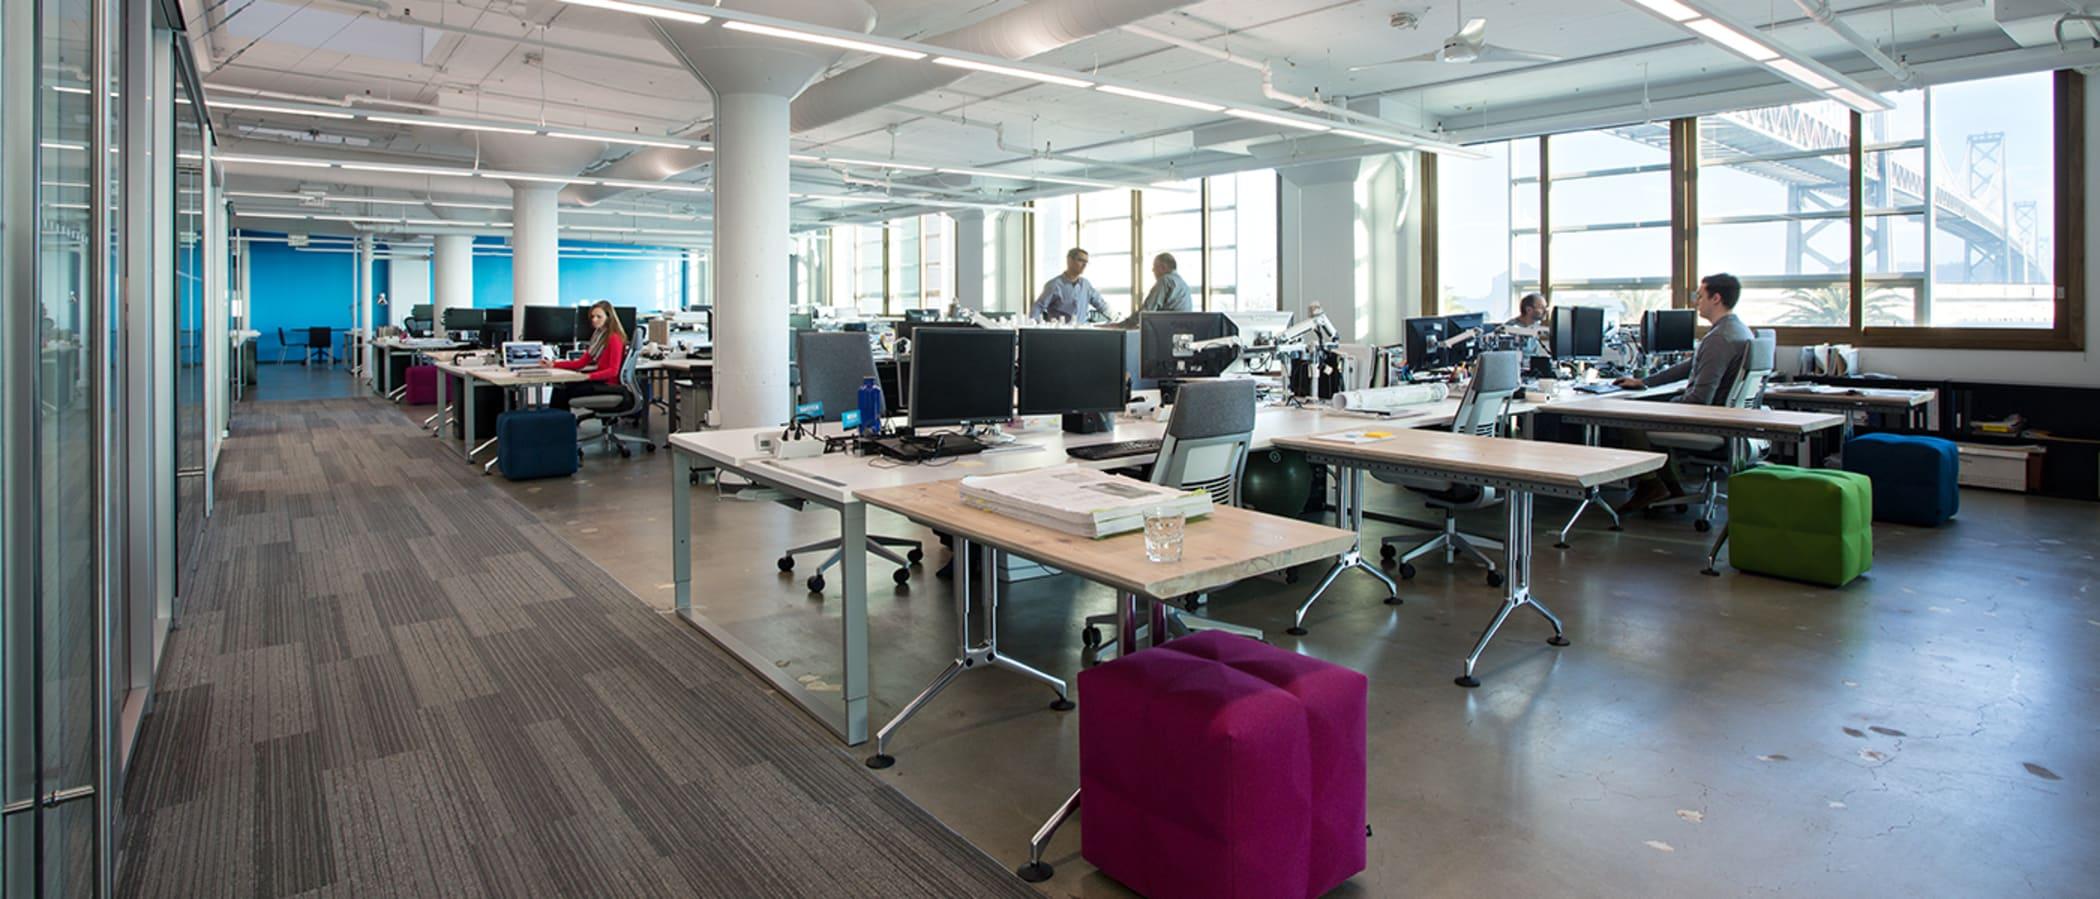 Open floor office Workplace Shrm Beyond The Open Office